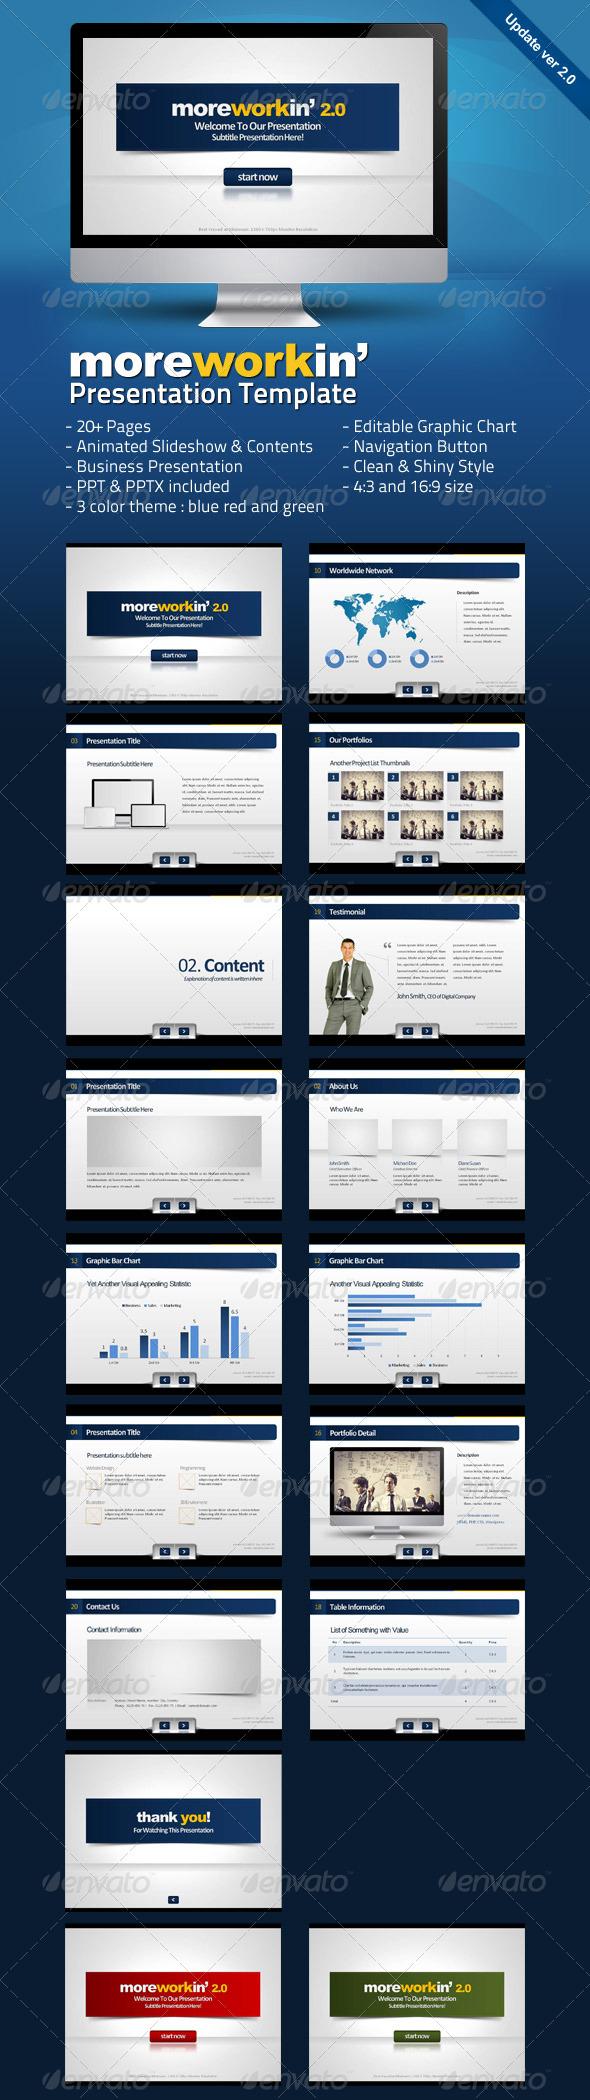 Moreworkin Business Powerpoint Presentation - Business Powerpoint Templates